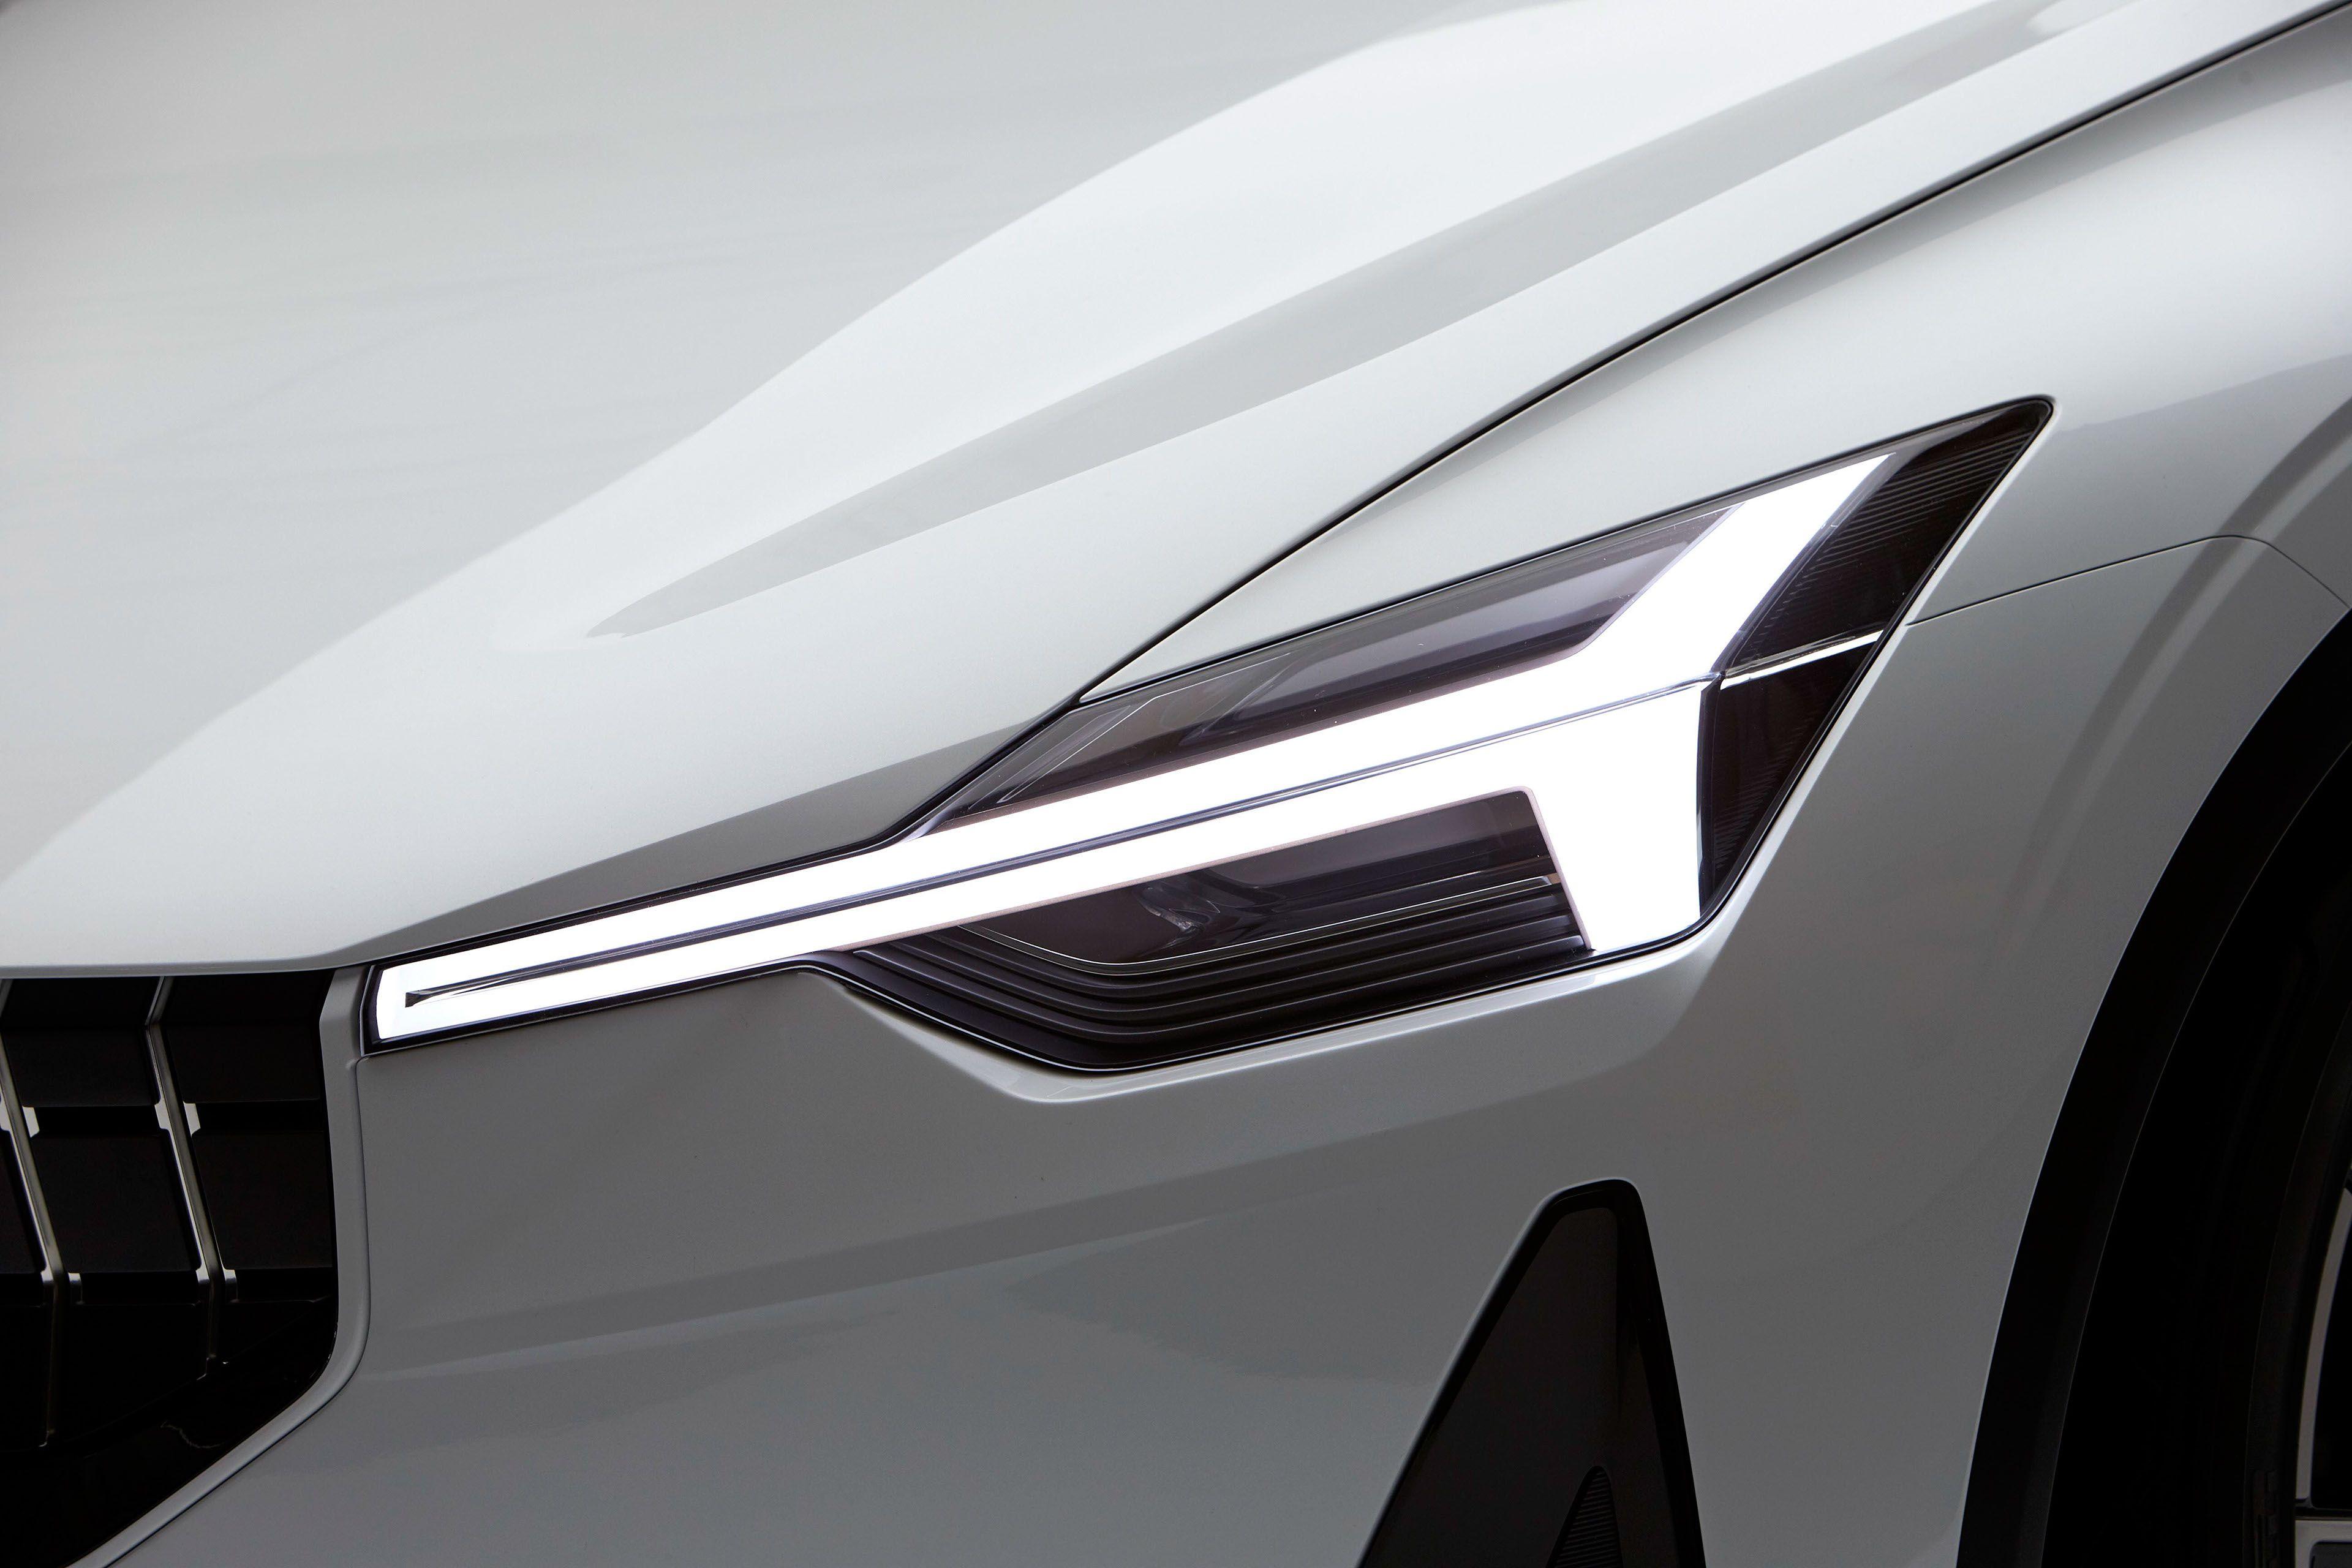 Lexus lf gh concept 2011 exterior detail 49 of 49 1600x1200 - Volvo Concept 40 2 Event Pictures On Behance